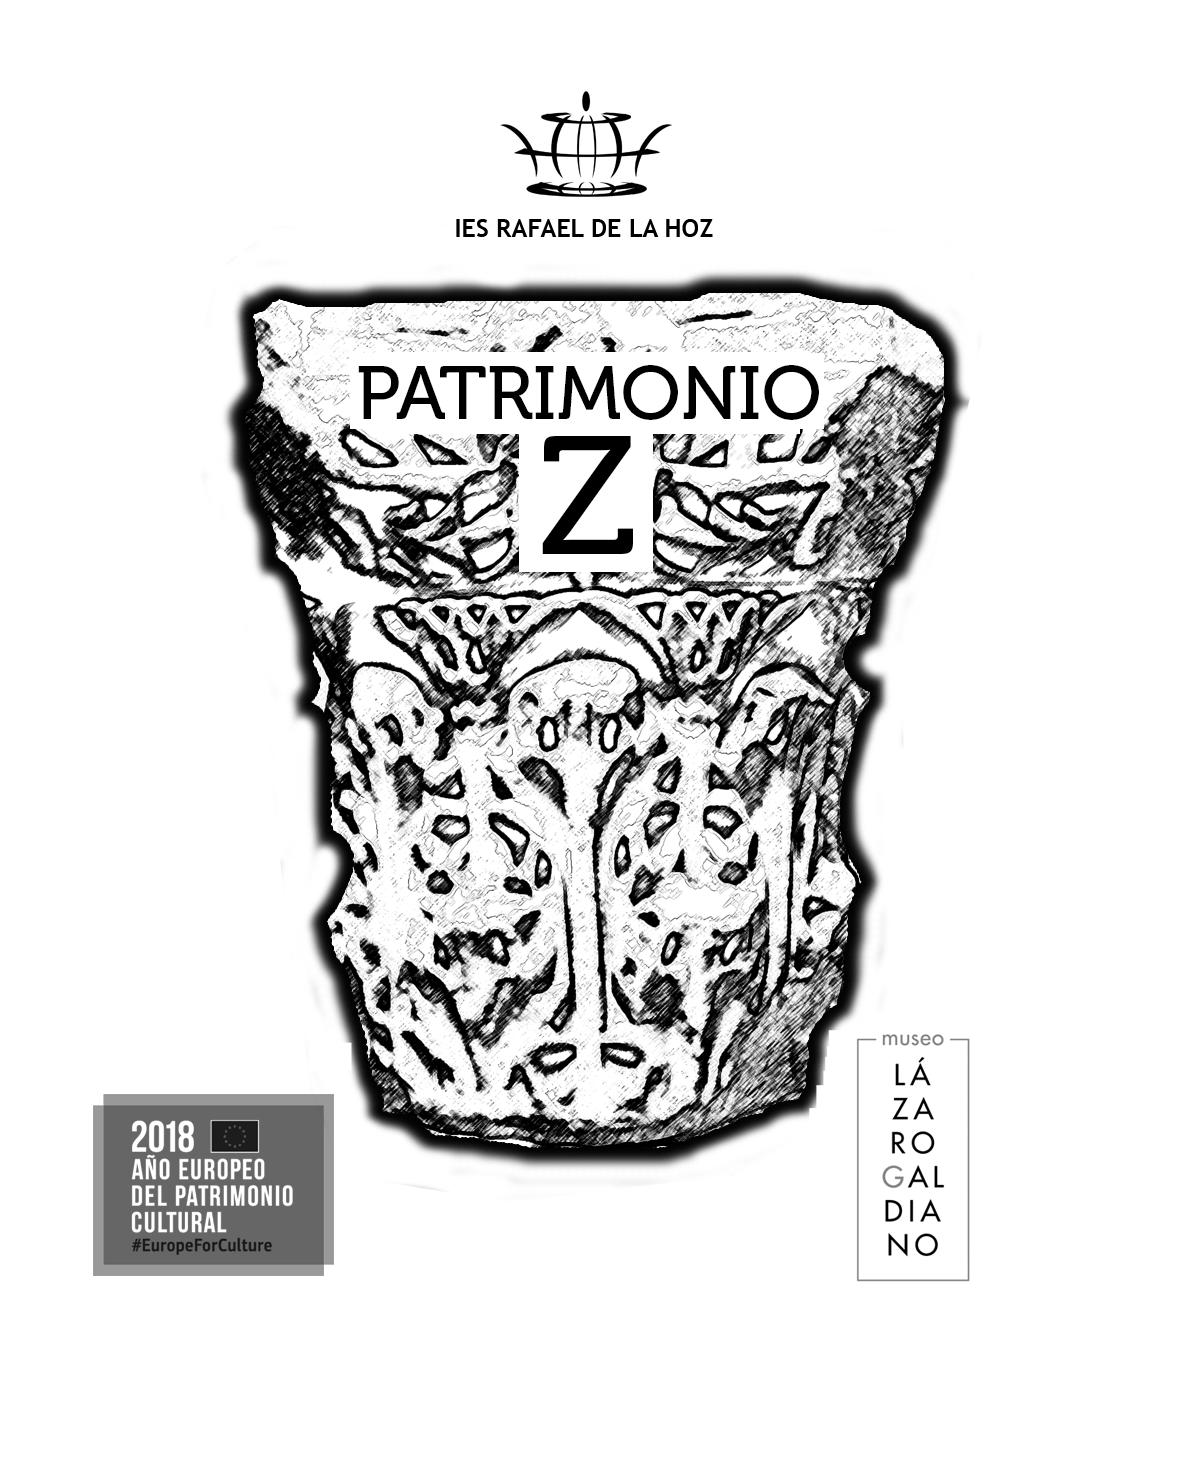 PATRIMONIO Z